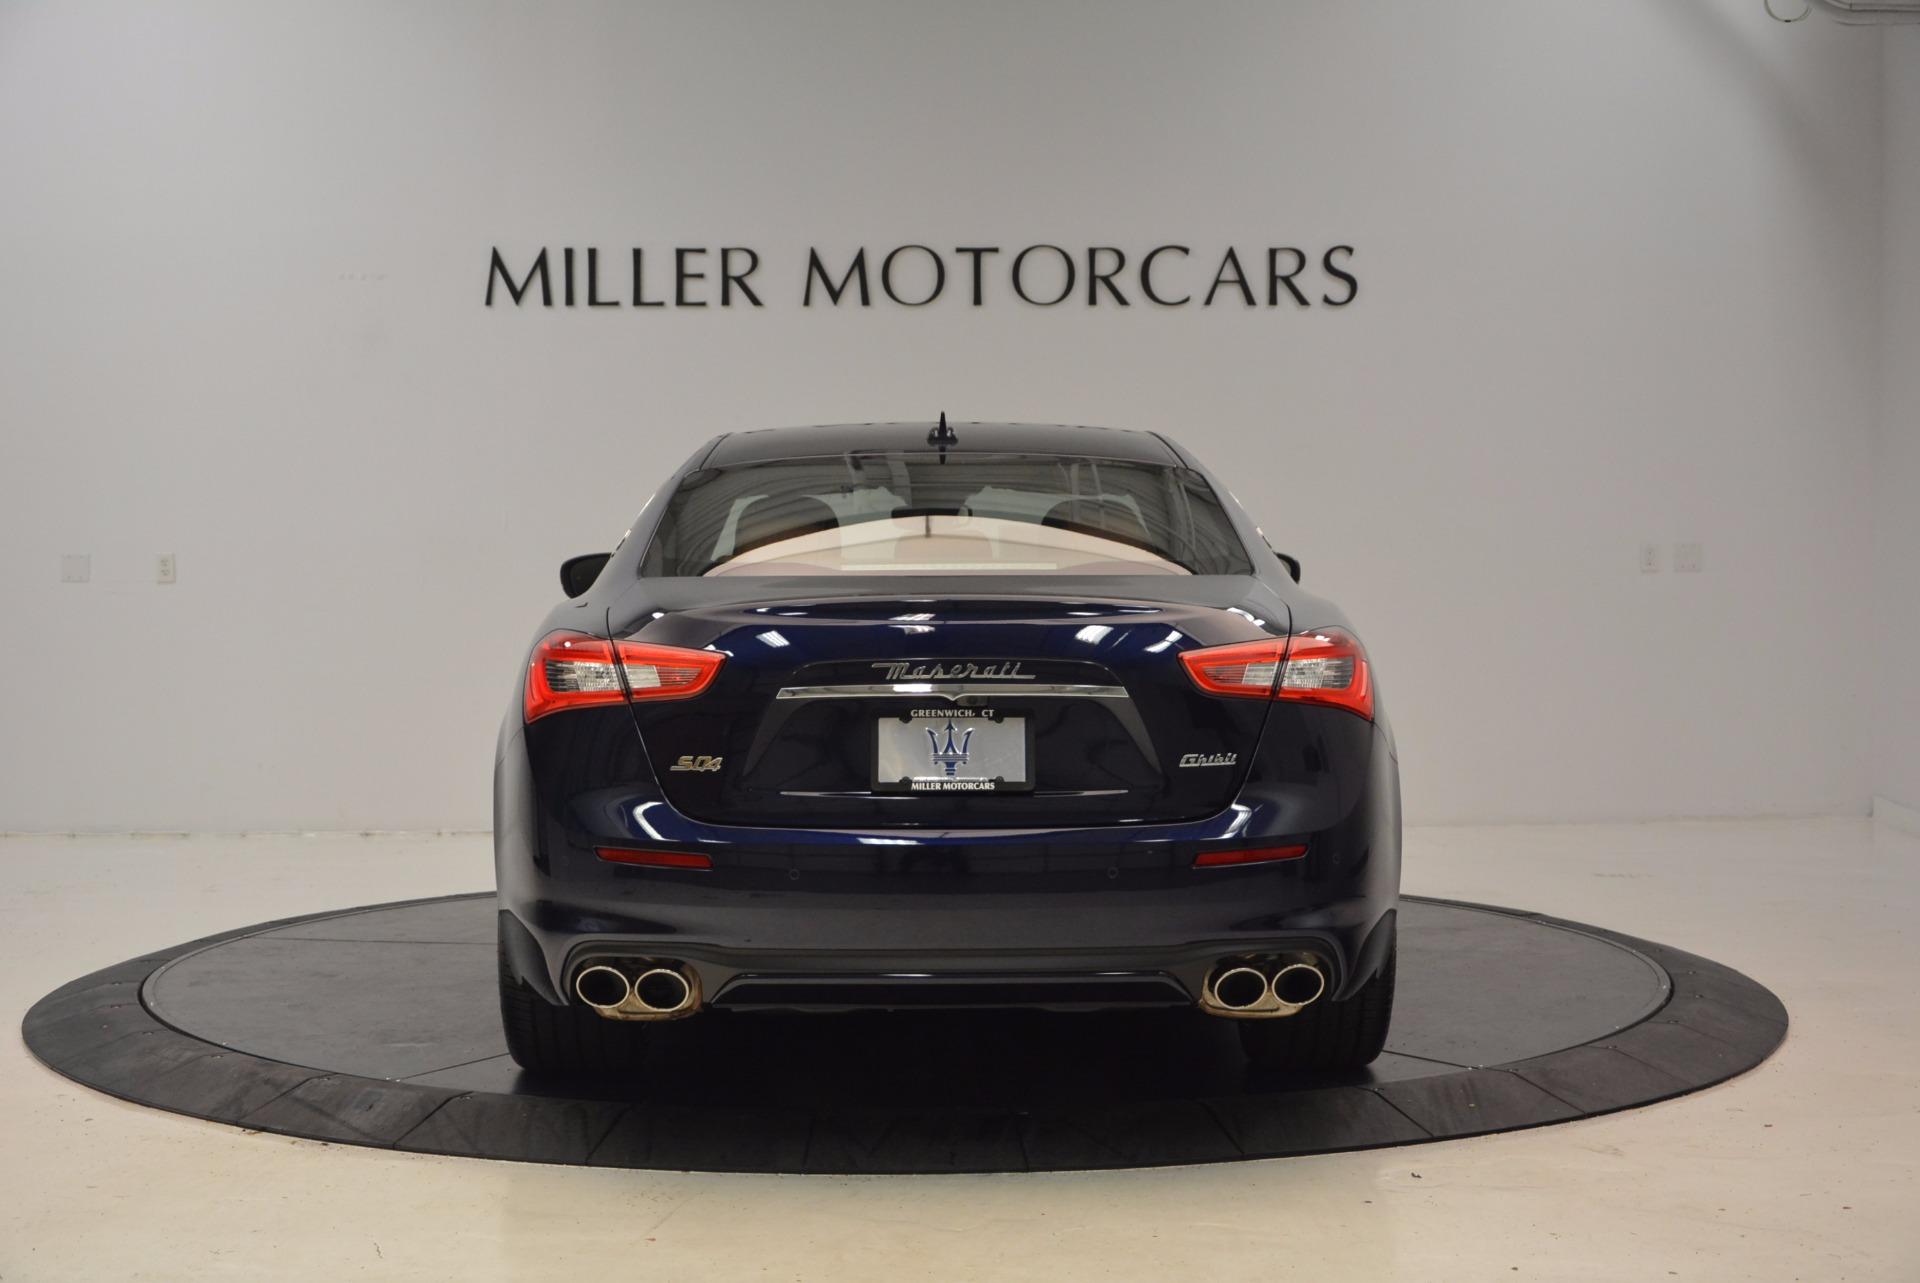 New 2018 Maserati Ghibli S Q4 GranLusso For Sale In Westport, CT 1866_p6